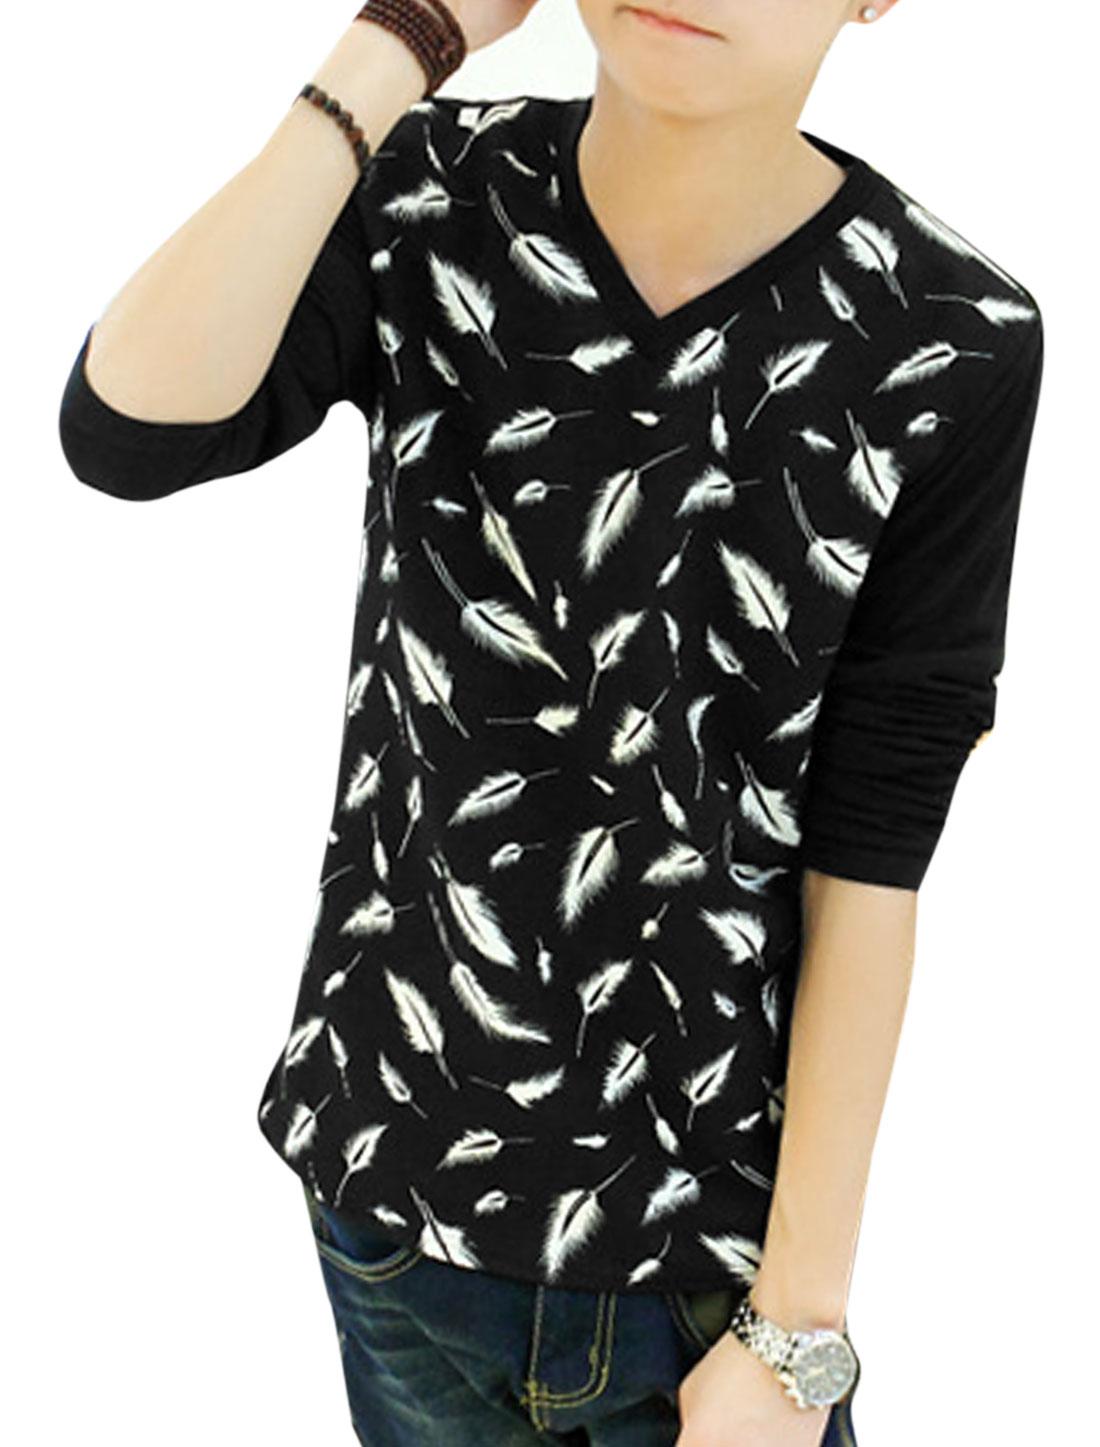 Men Feather Print Contrast Splicing Design Casual T-Shirt Black S